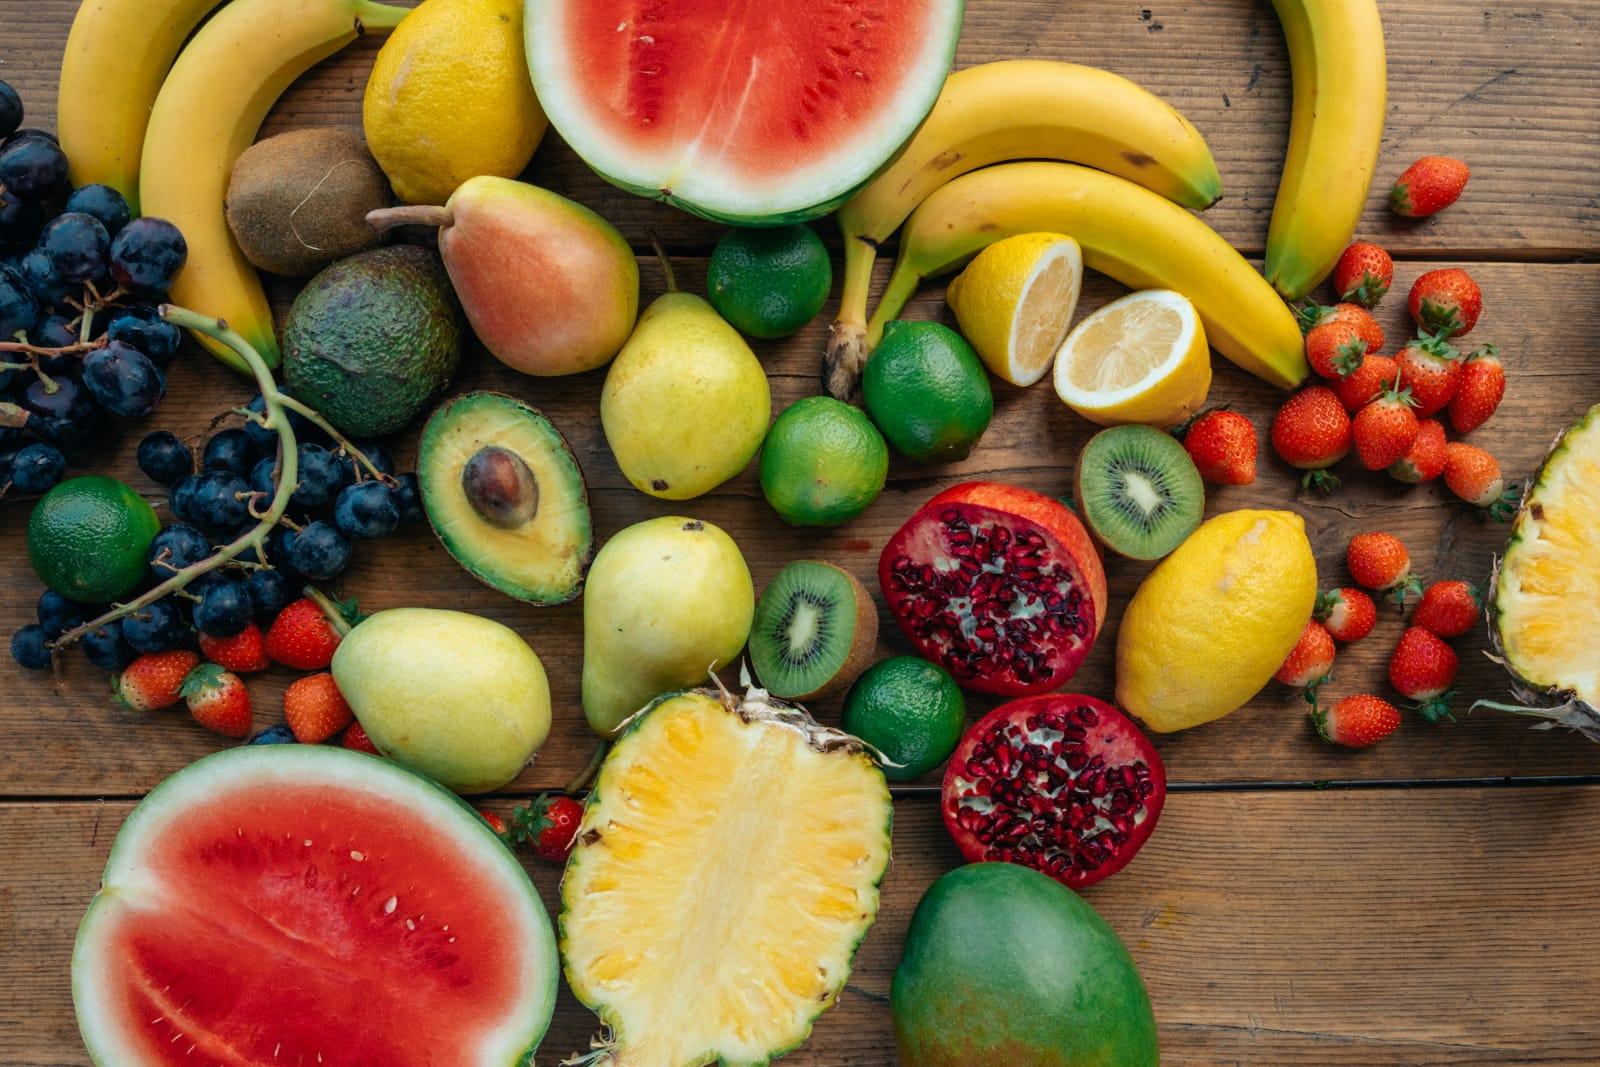 jenis buah untuk kecantikan